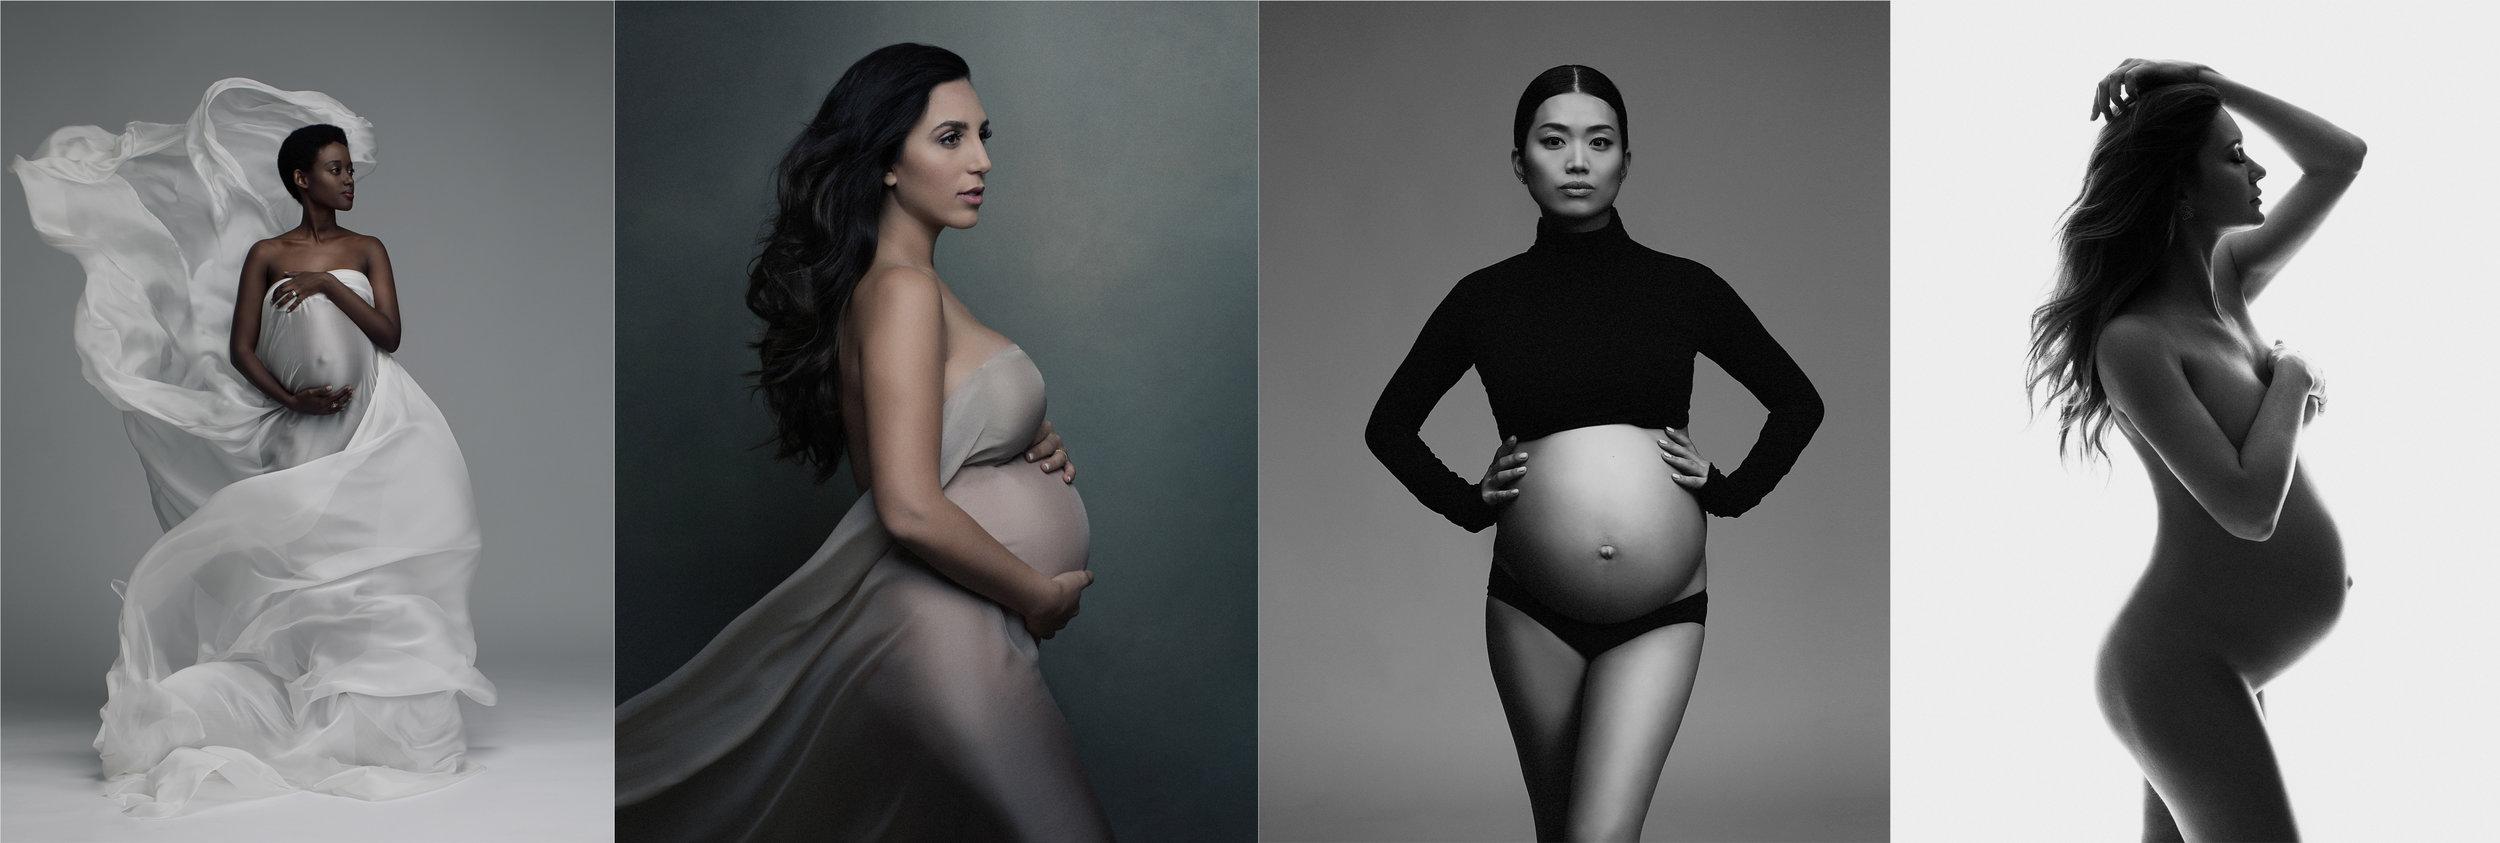 london collage-2.jpg